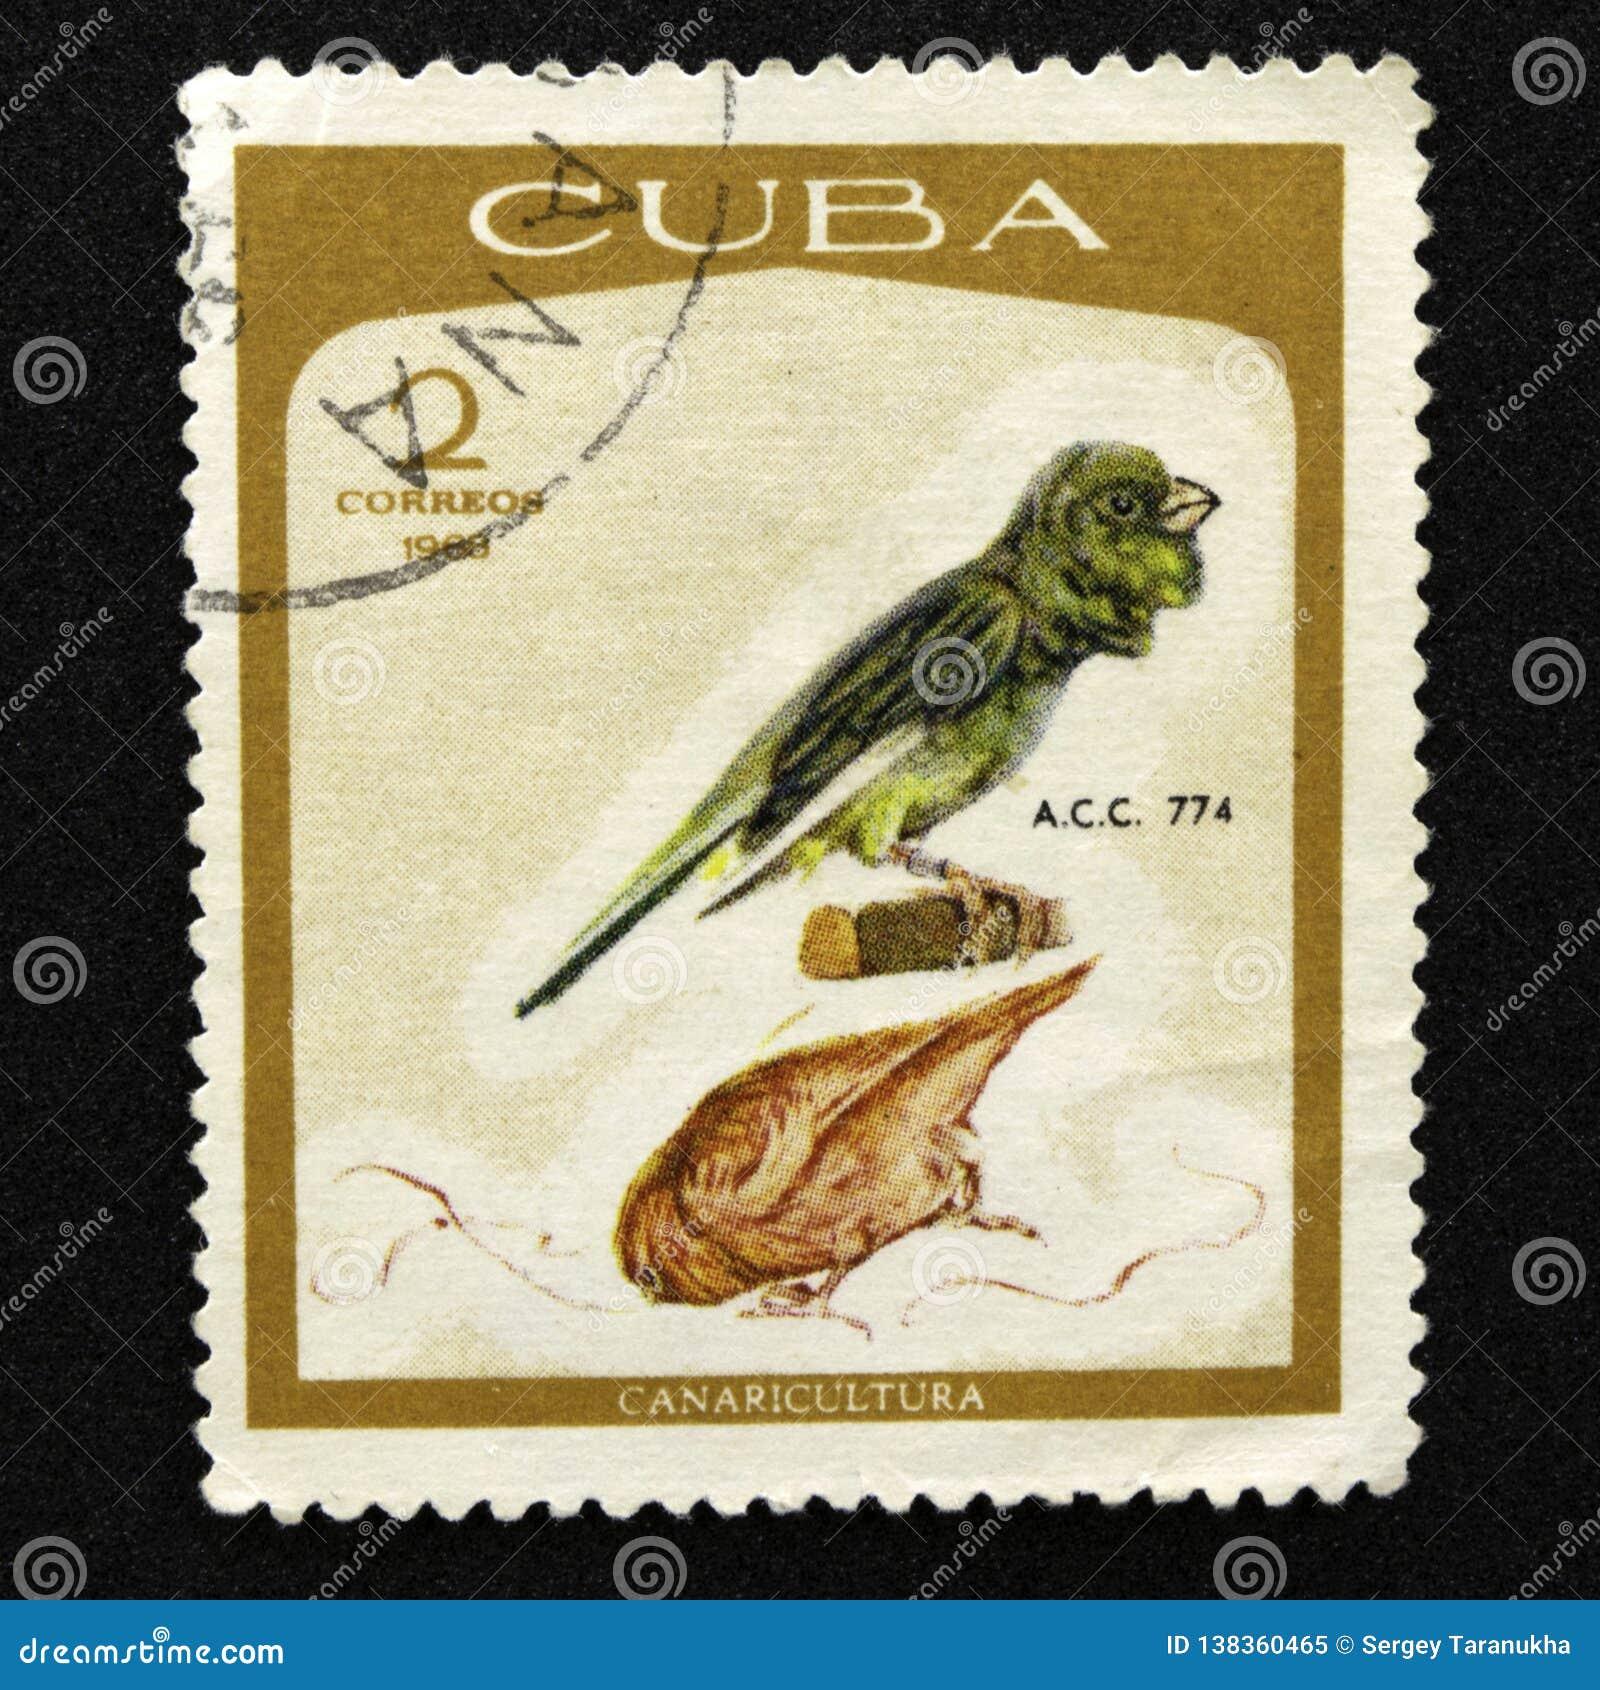 Mark of the Cuban Post